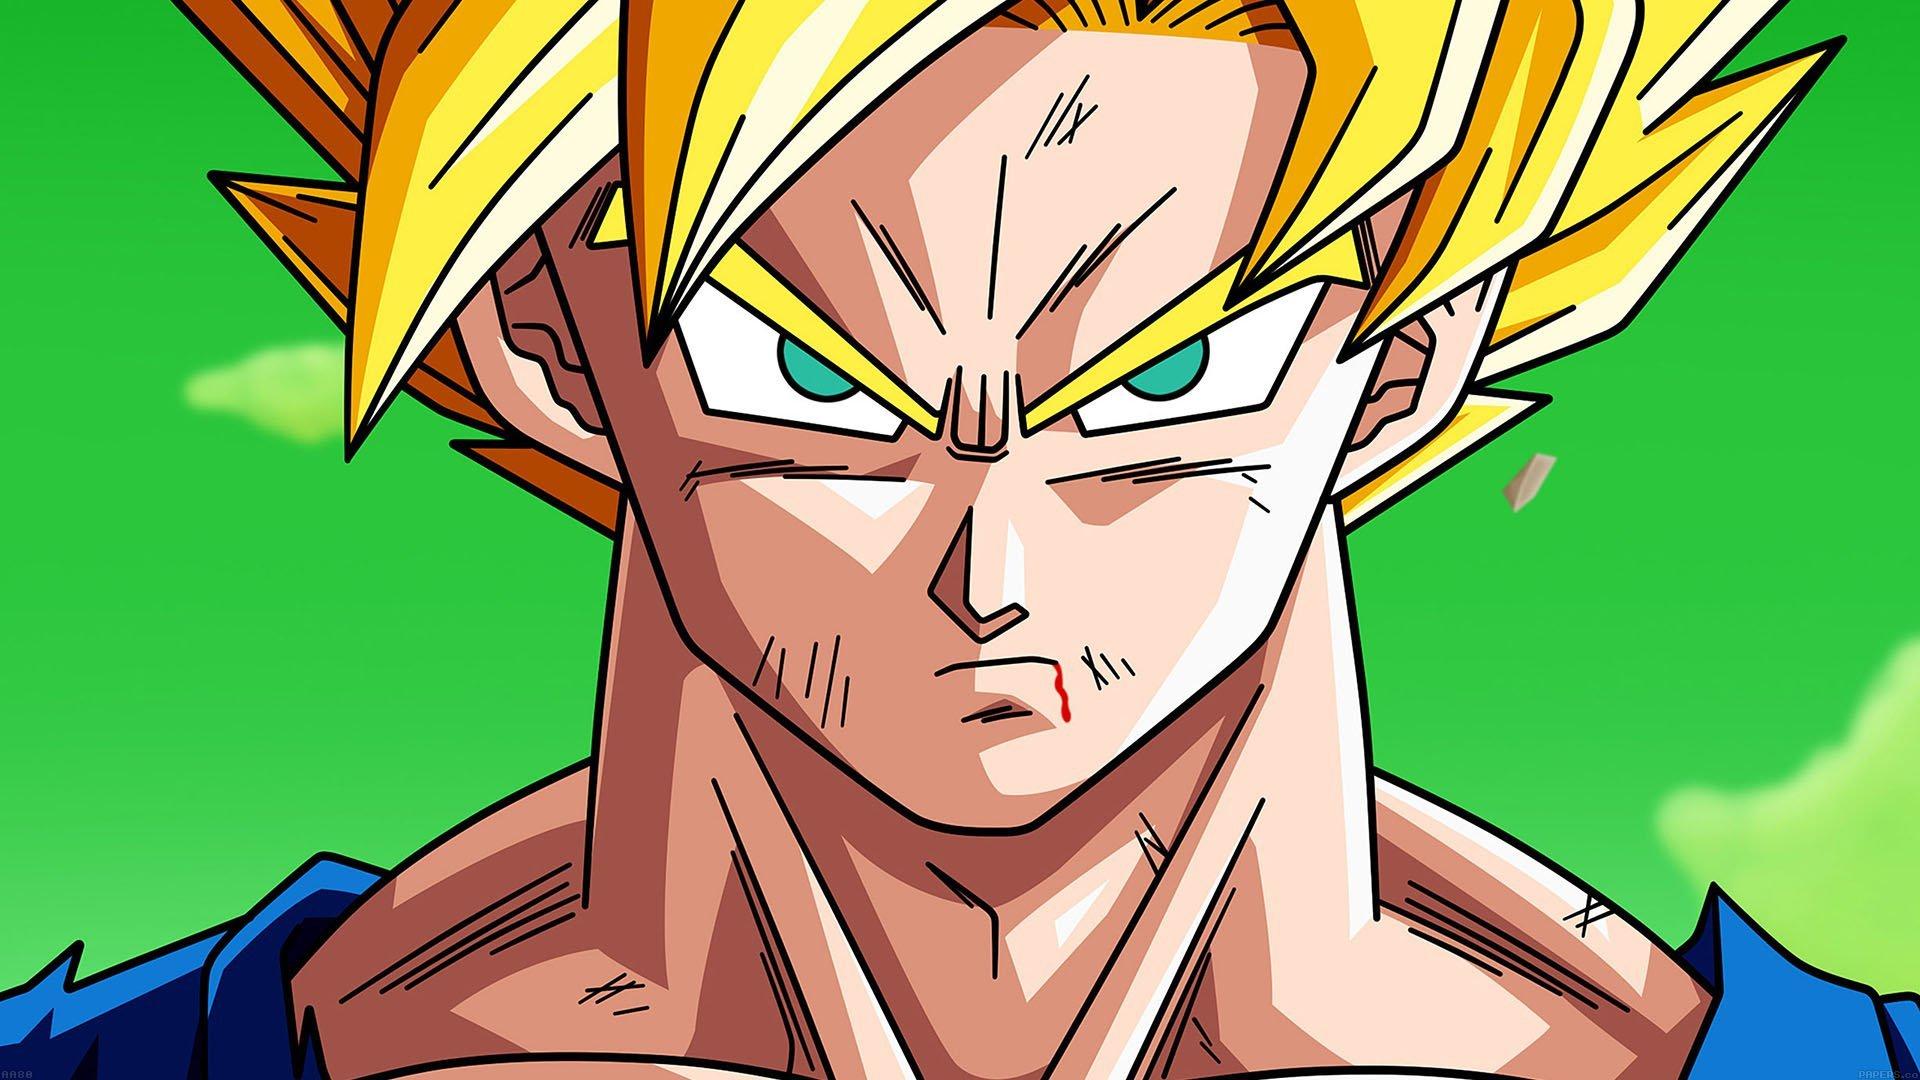 47 Goku Desktop Wallpaper On Wallpapersafari